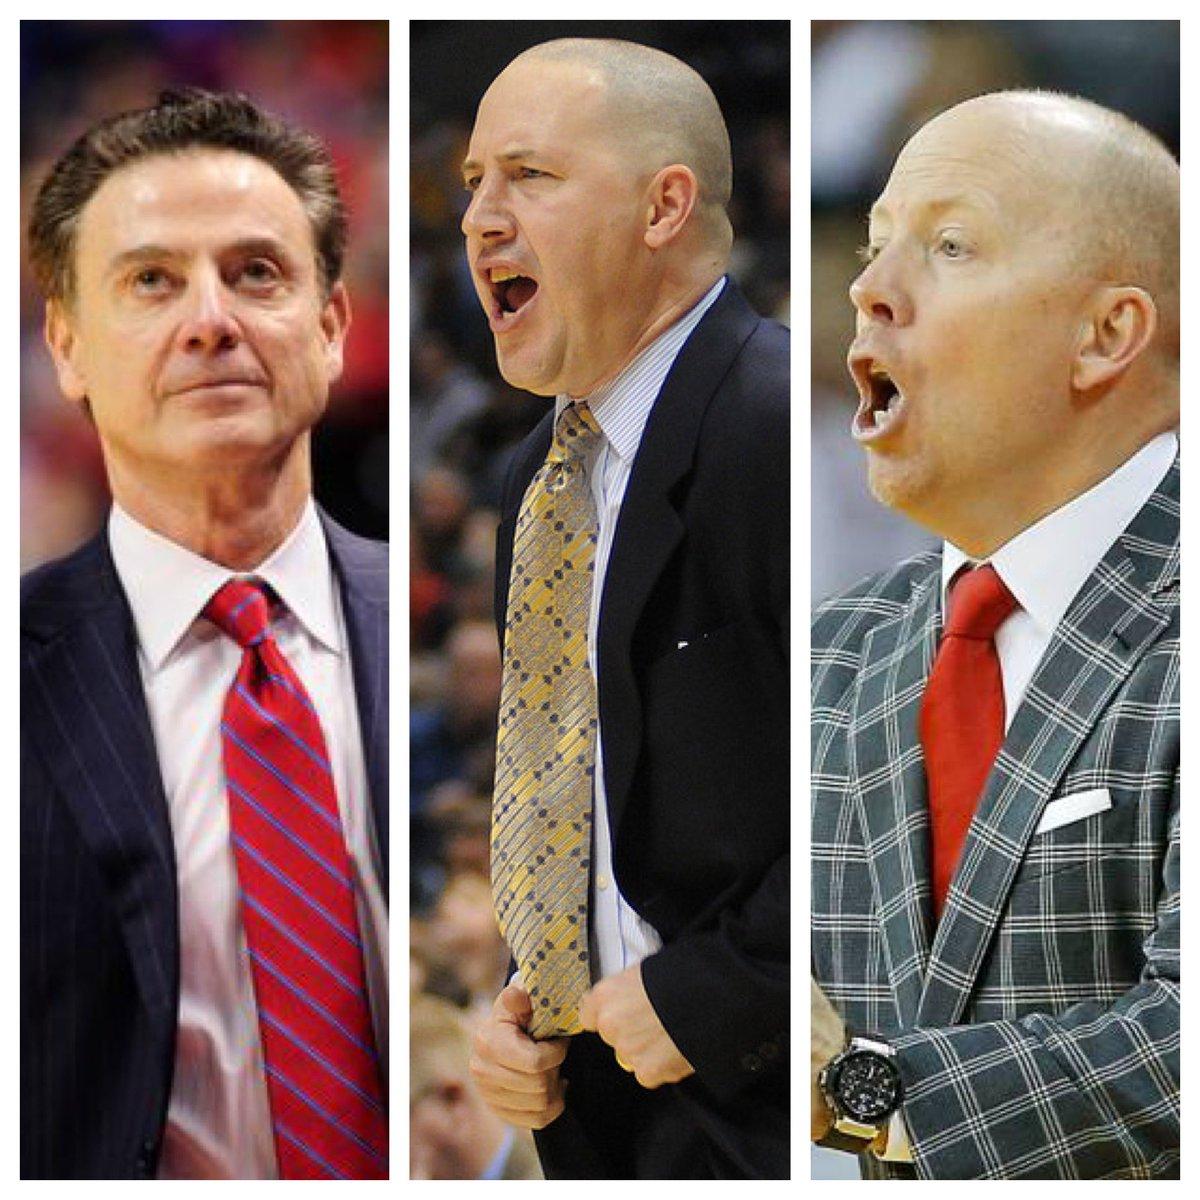 MY Top 3 @UCLAMBB  Coach Candidates   1) Rick Pitino  2) Buzz Williams (Virginia Tech)  3) Mick Cronin (Cincinnati) <br>http://pic.twitter.com/hTTCpHYxJs